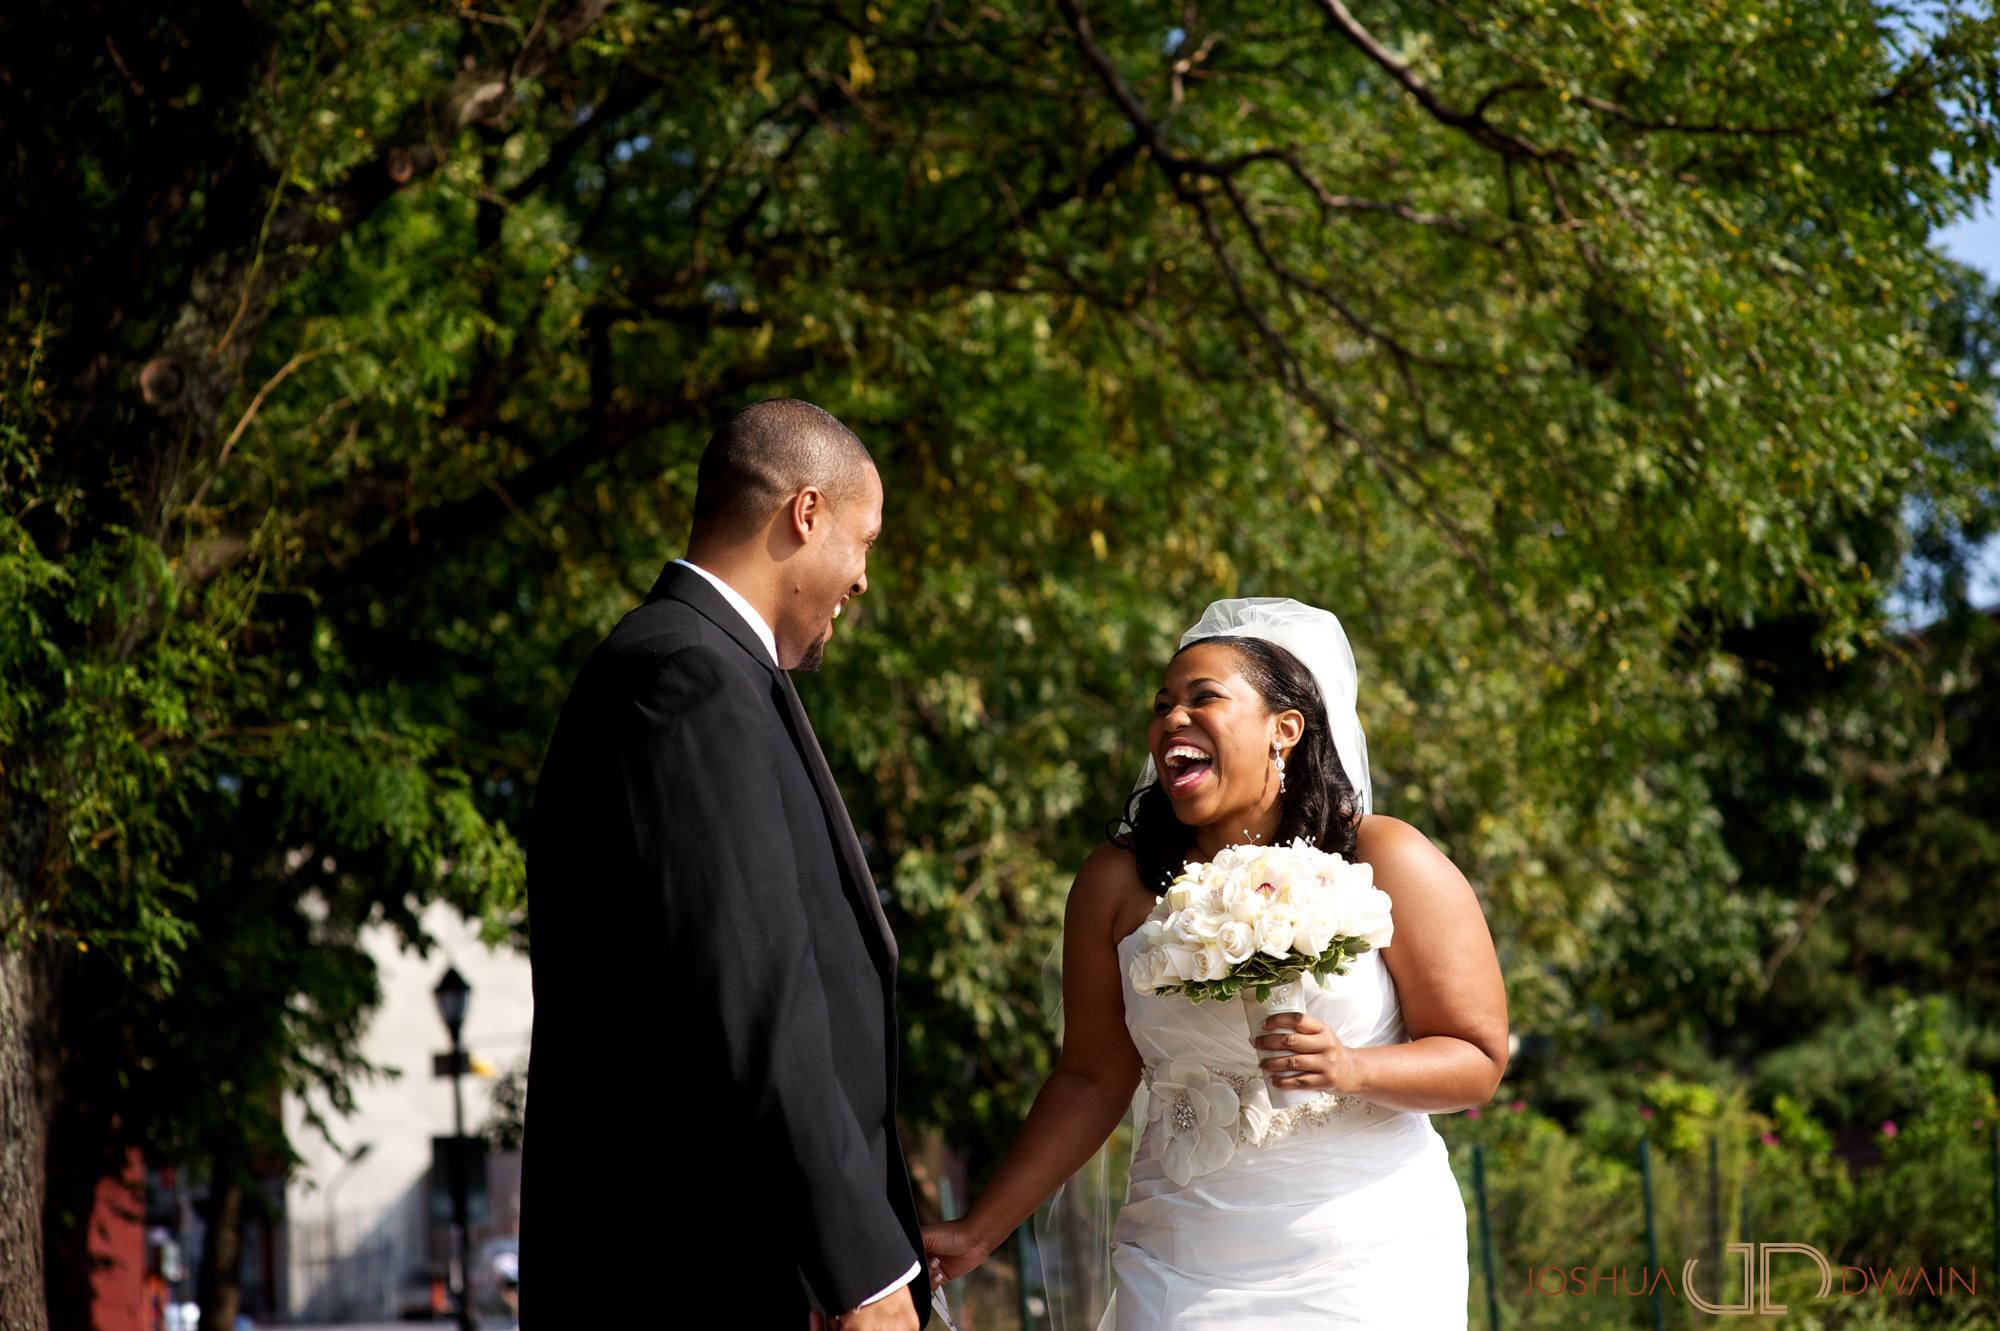 jessica-frank-010-giando-on-the-water-brooklyn-ny-wedding-photographer-joshua-dwain-2011-09-02_jf_208